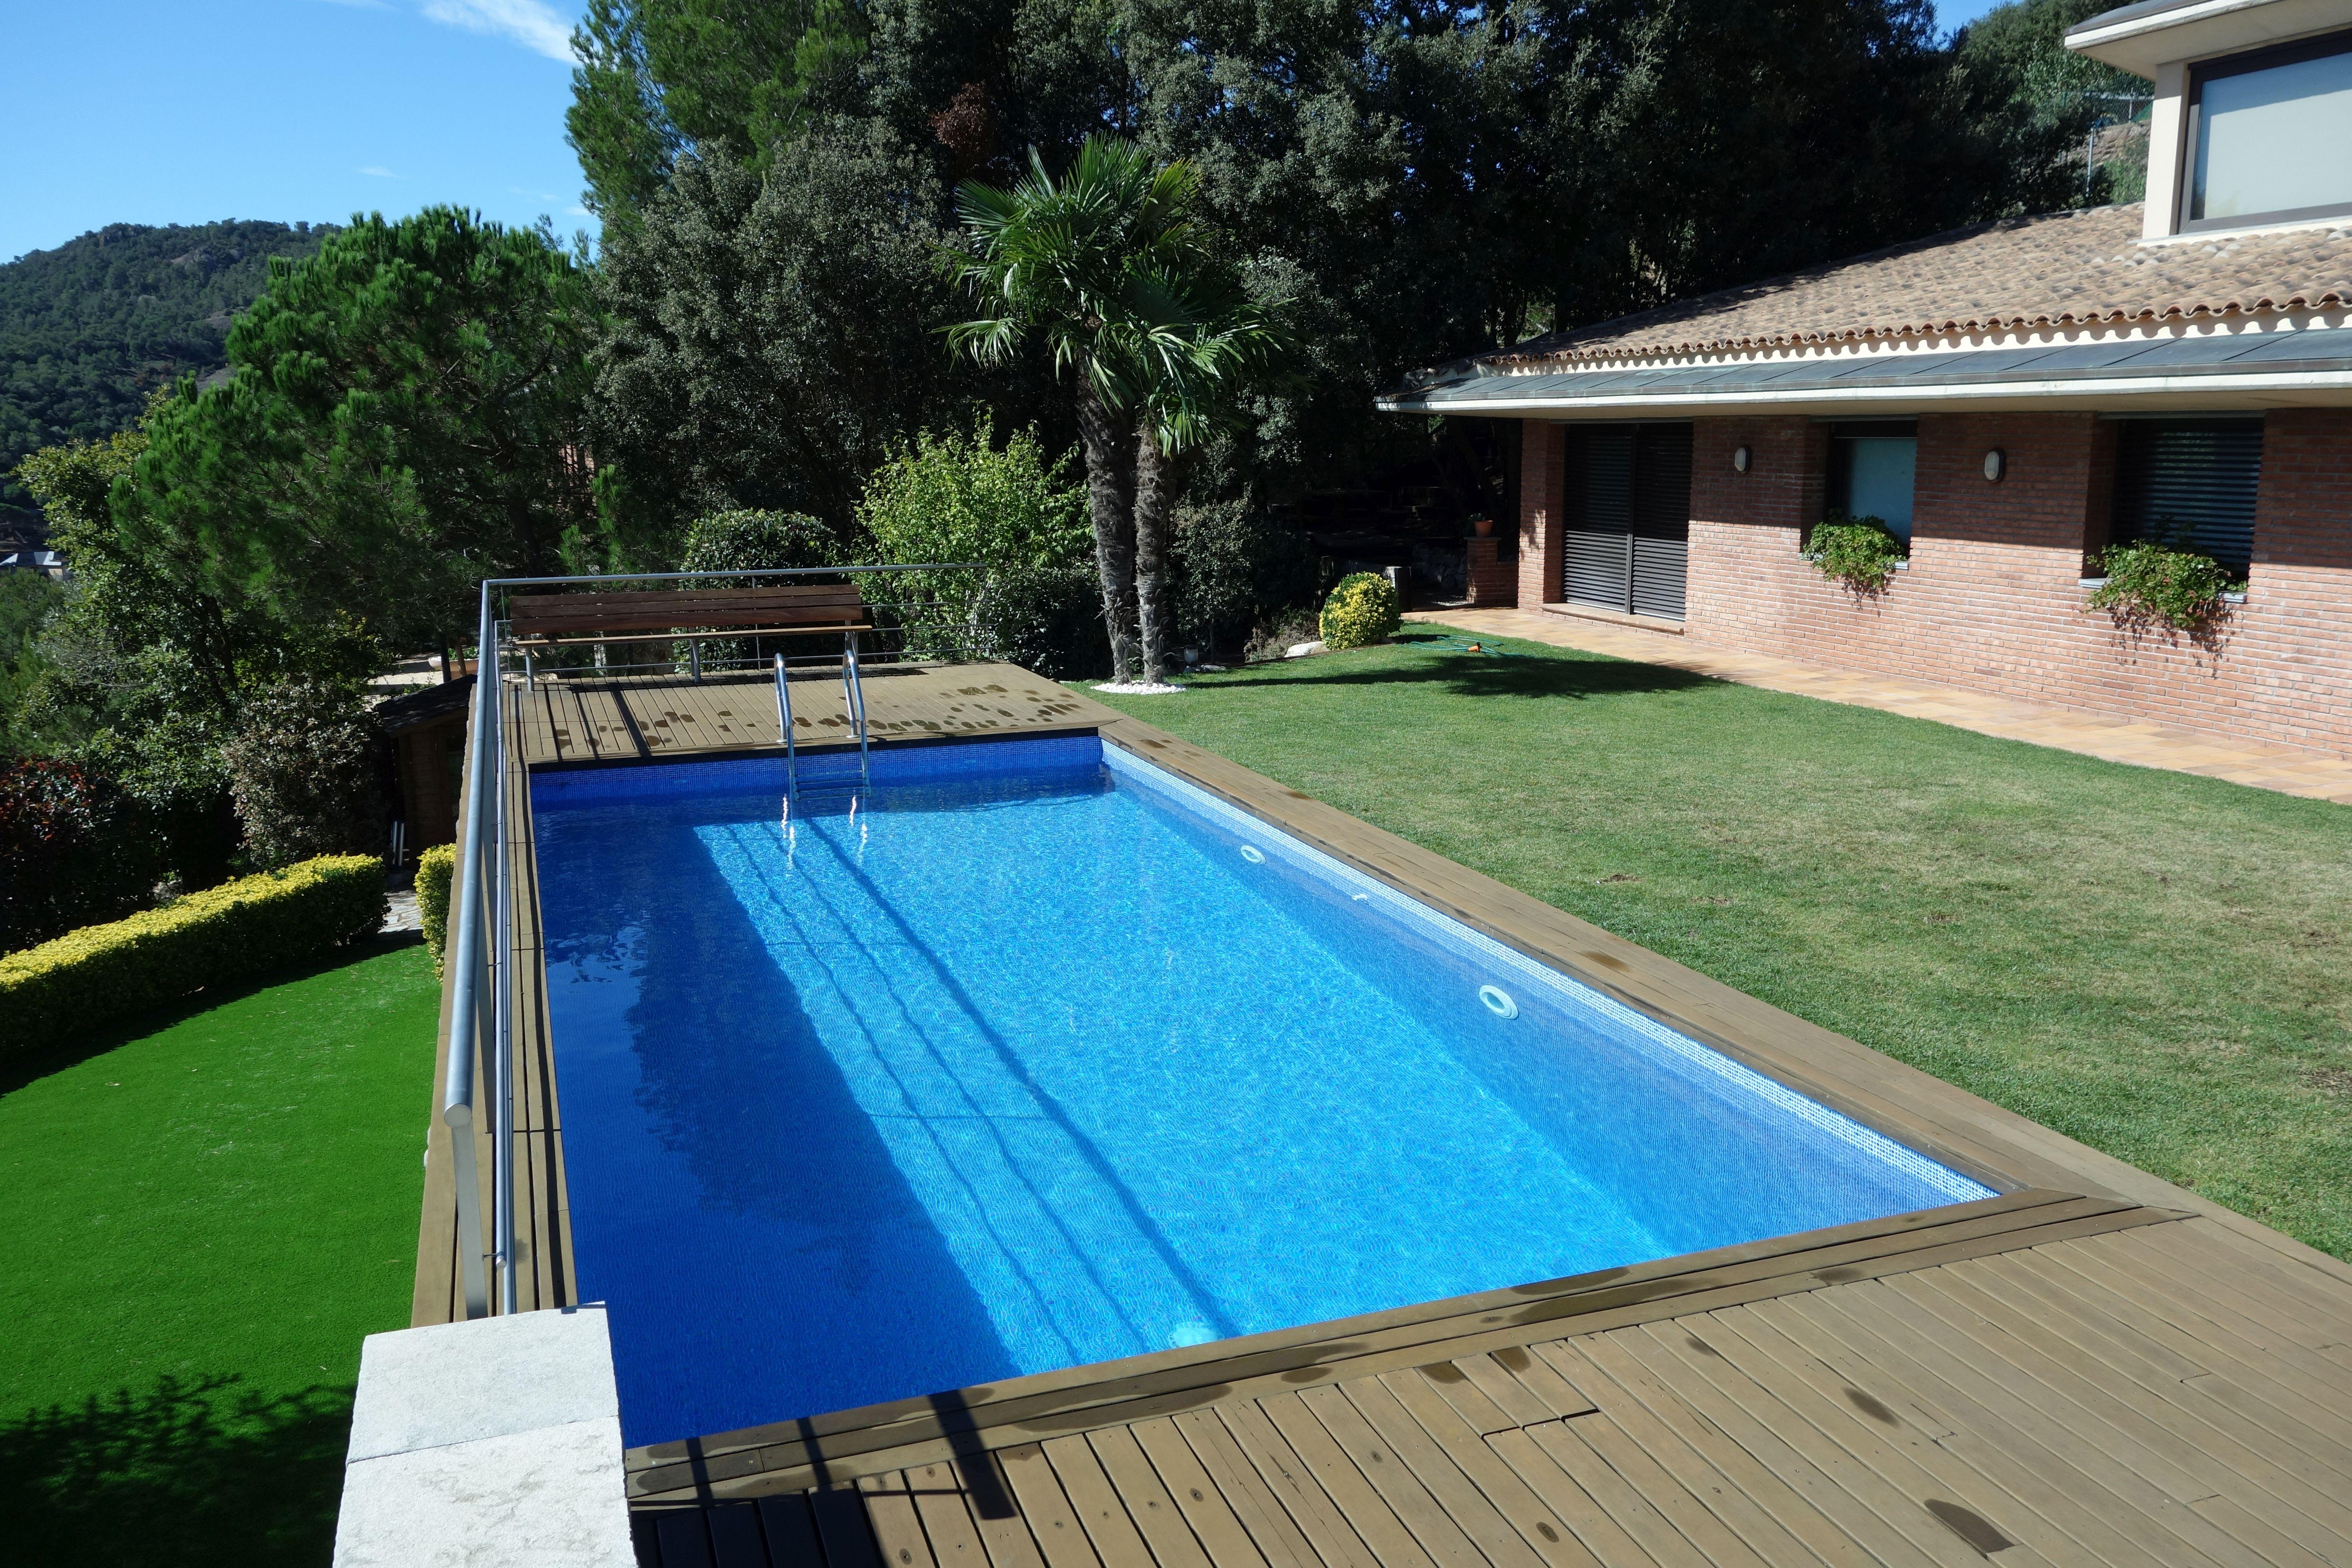 swimmingpoolabdichtung pool wasserg rten wild. Black Bedroom Furniture Sets. Home Design Ideas